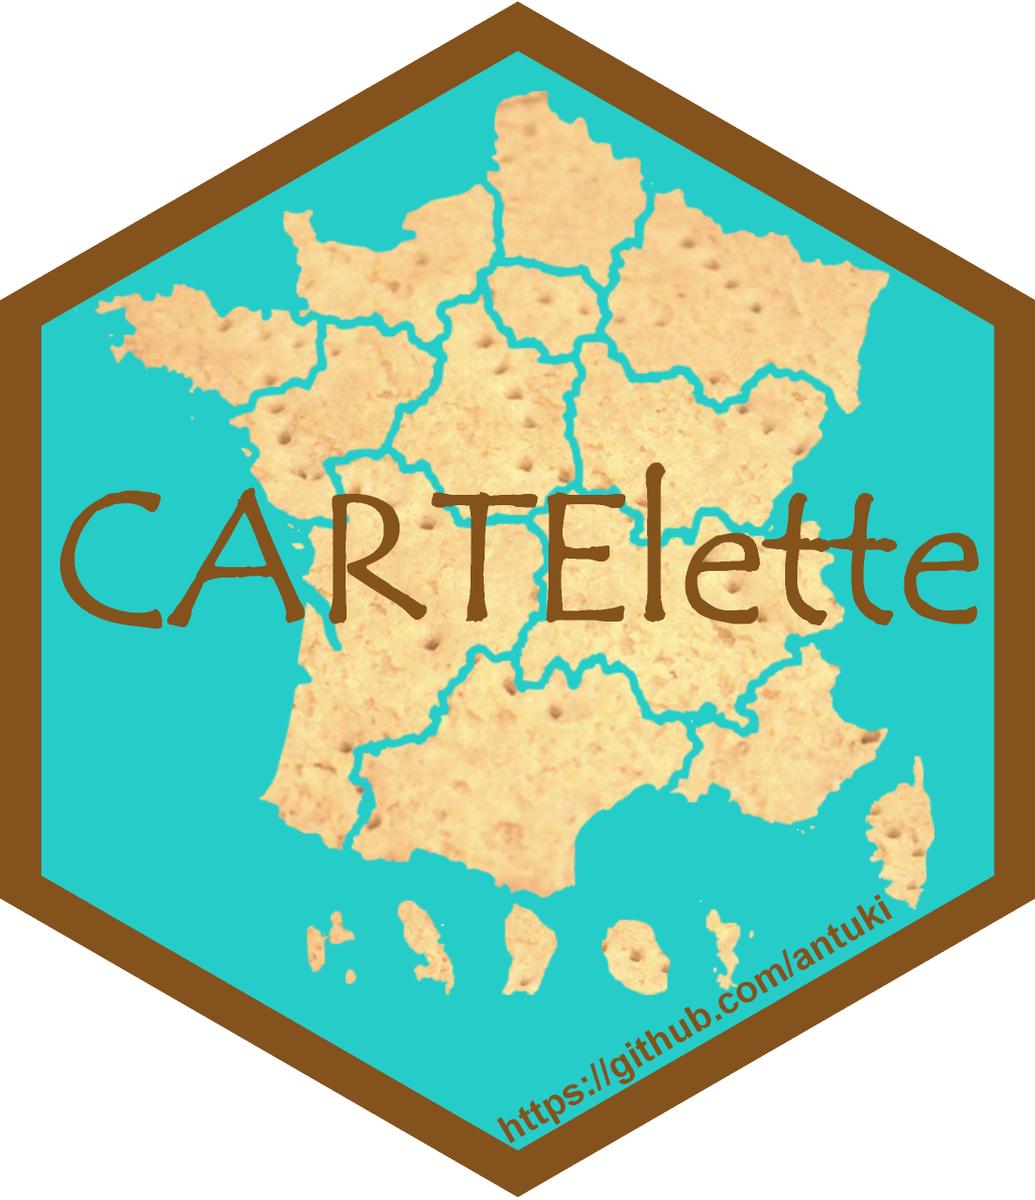 static/R-webinars/geospatial-data-presentation/images/cartelette.png